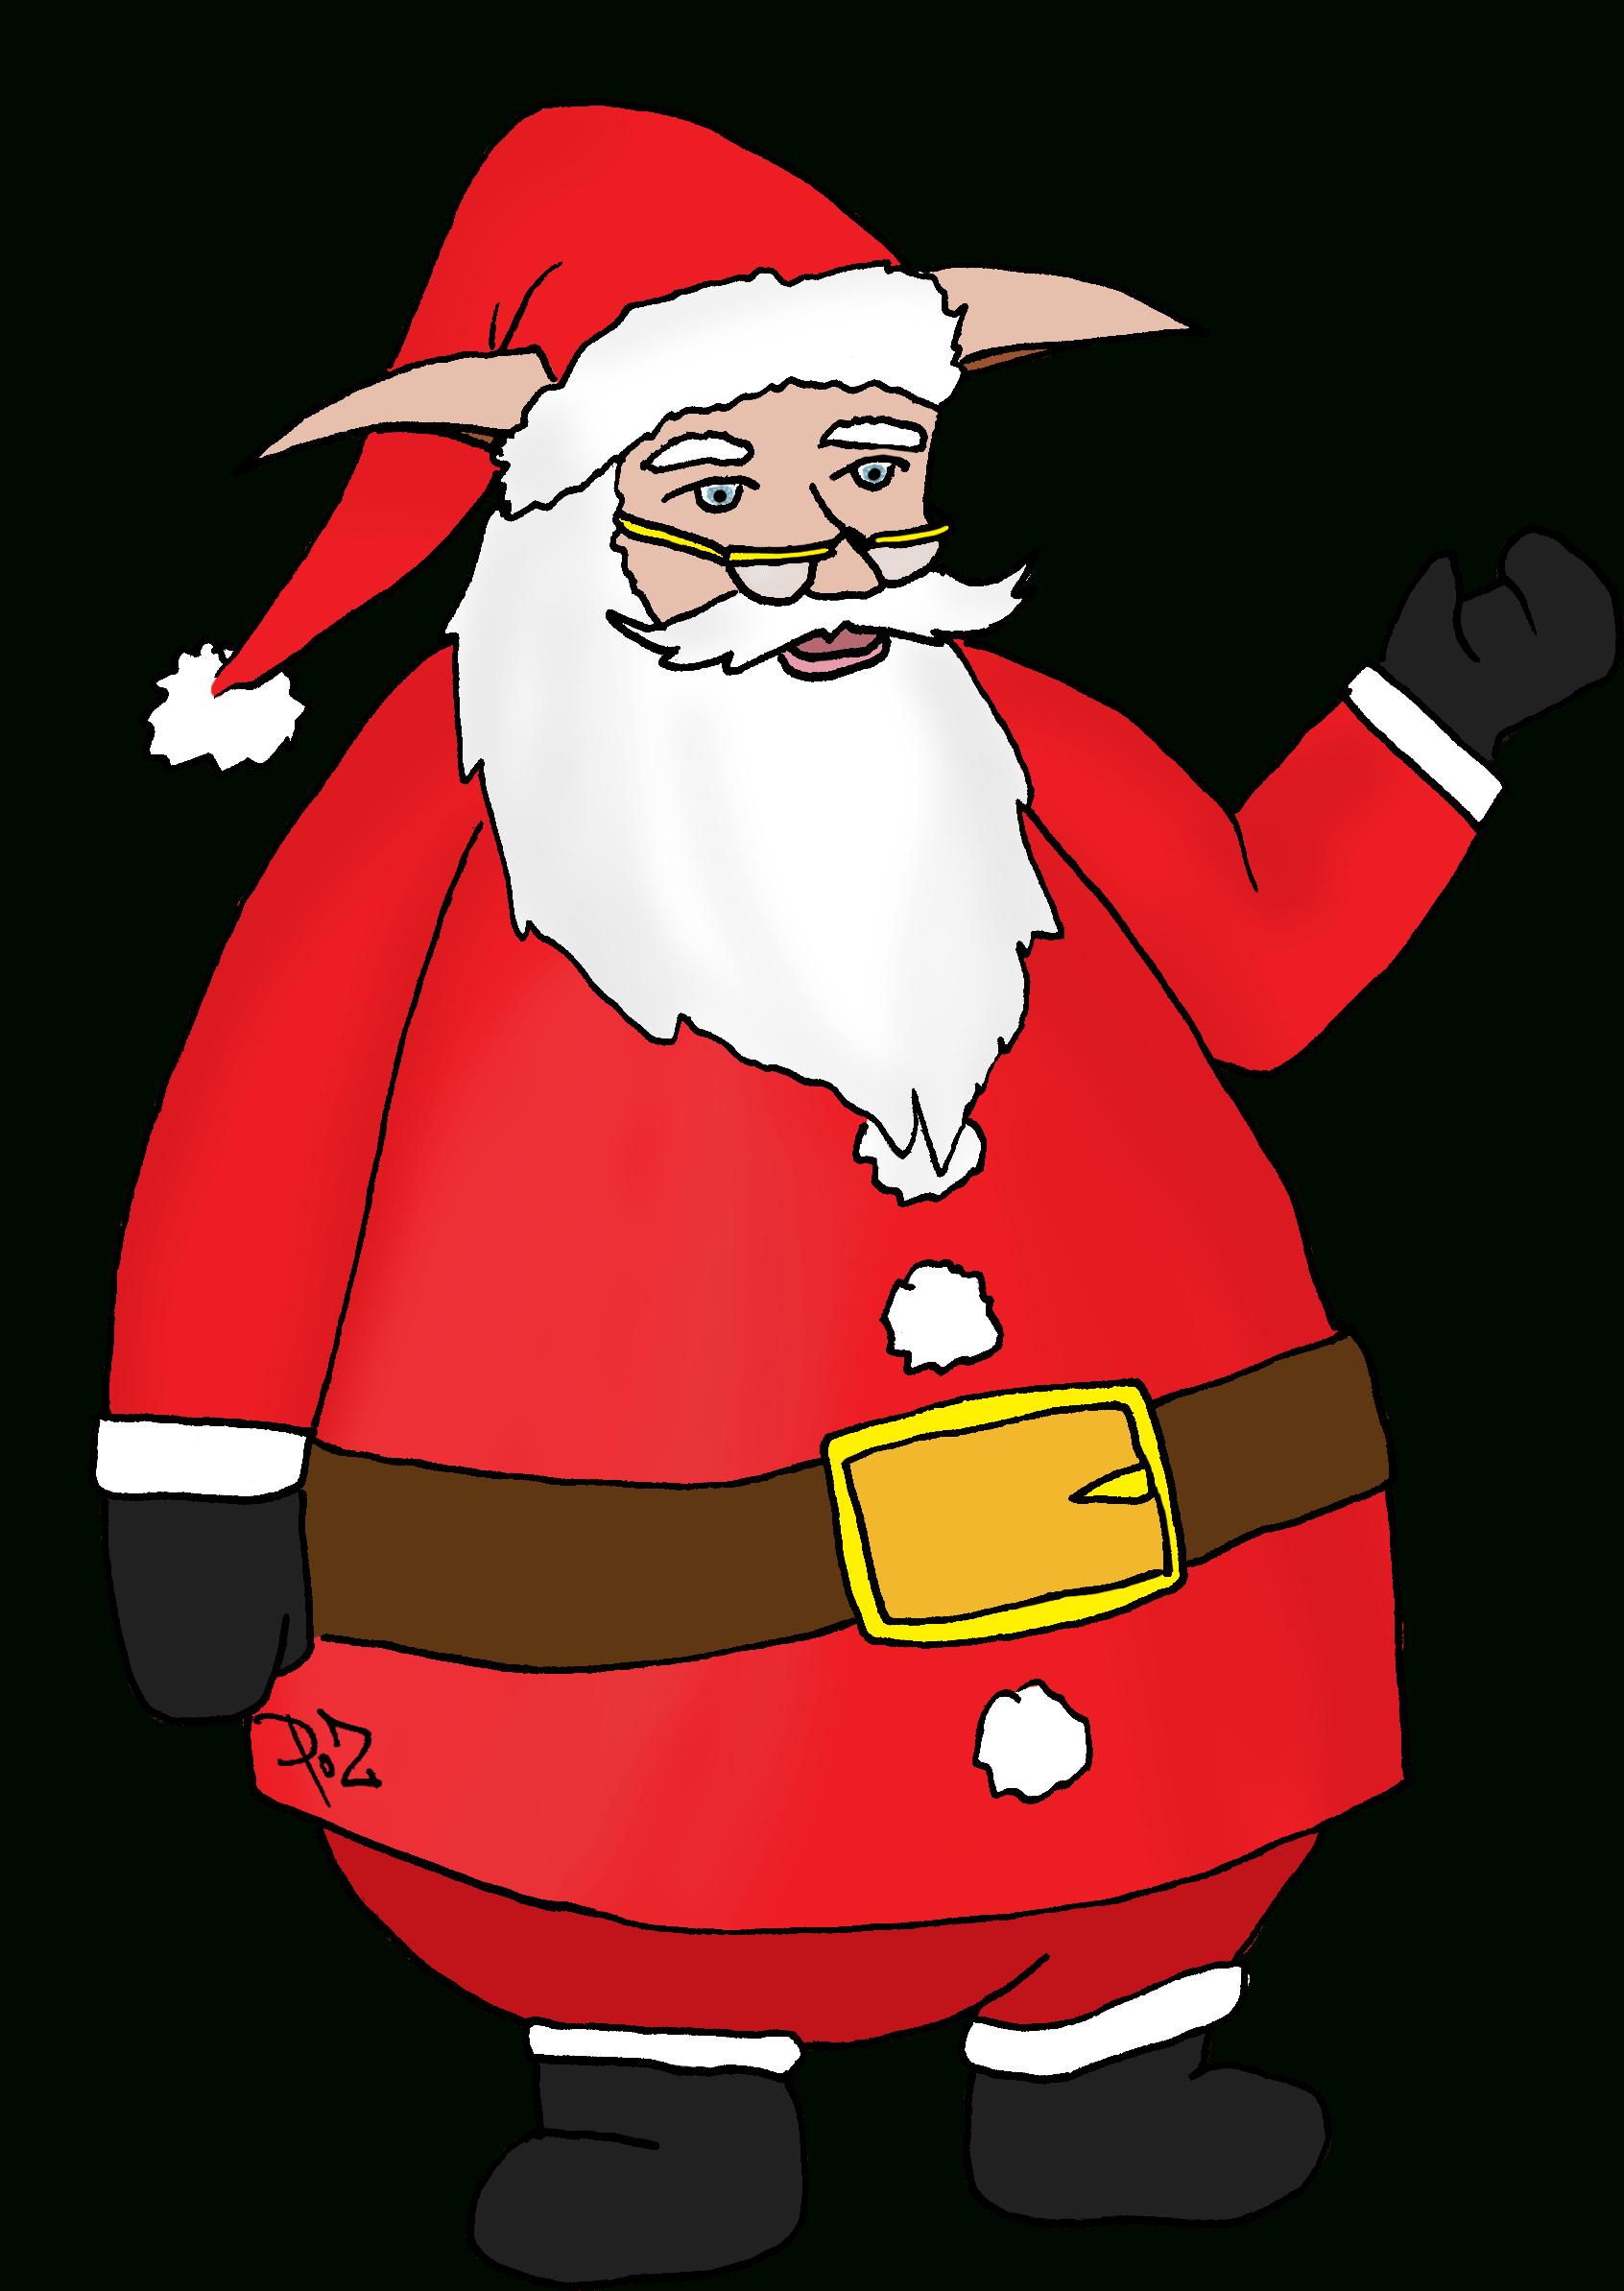 Coloriage Pere Noel A Imprimer Gratuit - Santa Claus Clipart concernant Coloriage De Pere Noel A Imprimer Gratuitement